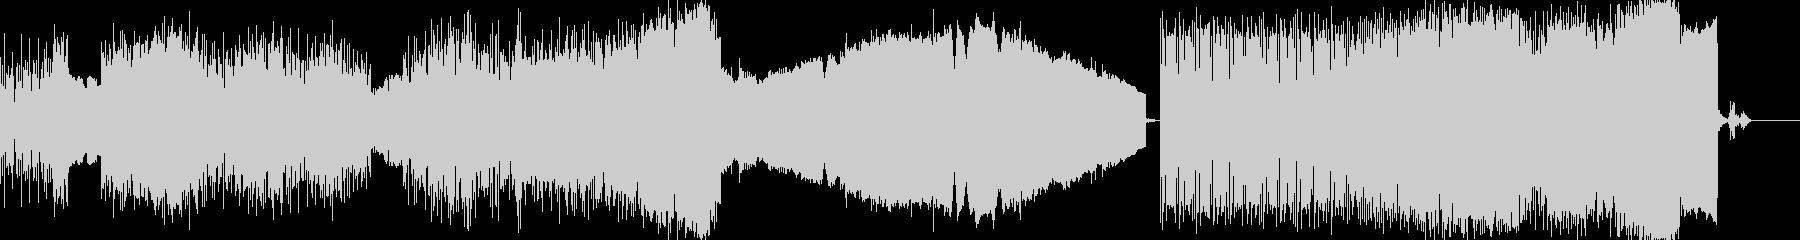 EDM  少しアンダーグラウンド的なト…の未再生の波形